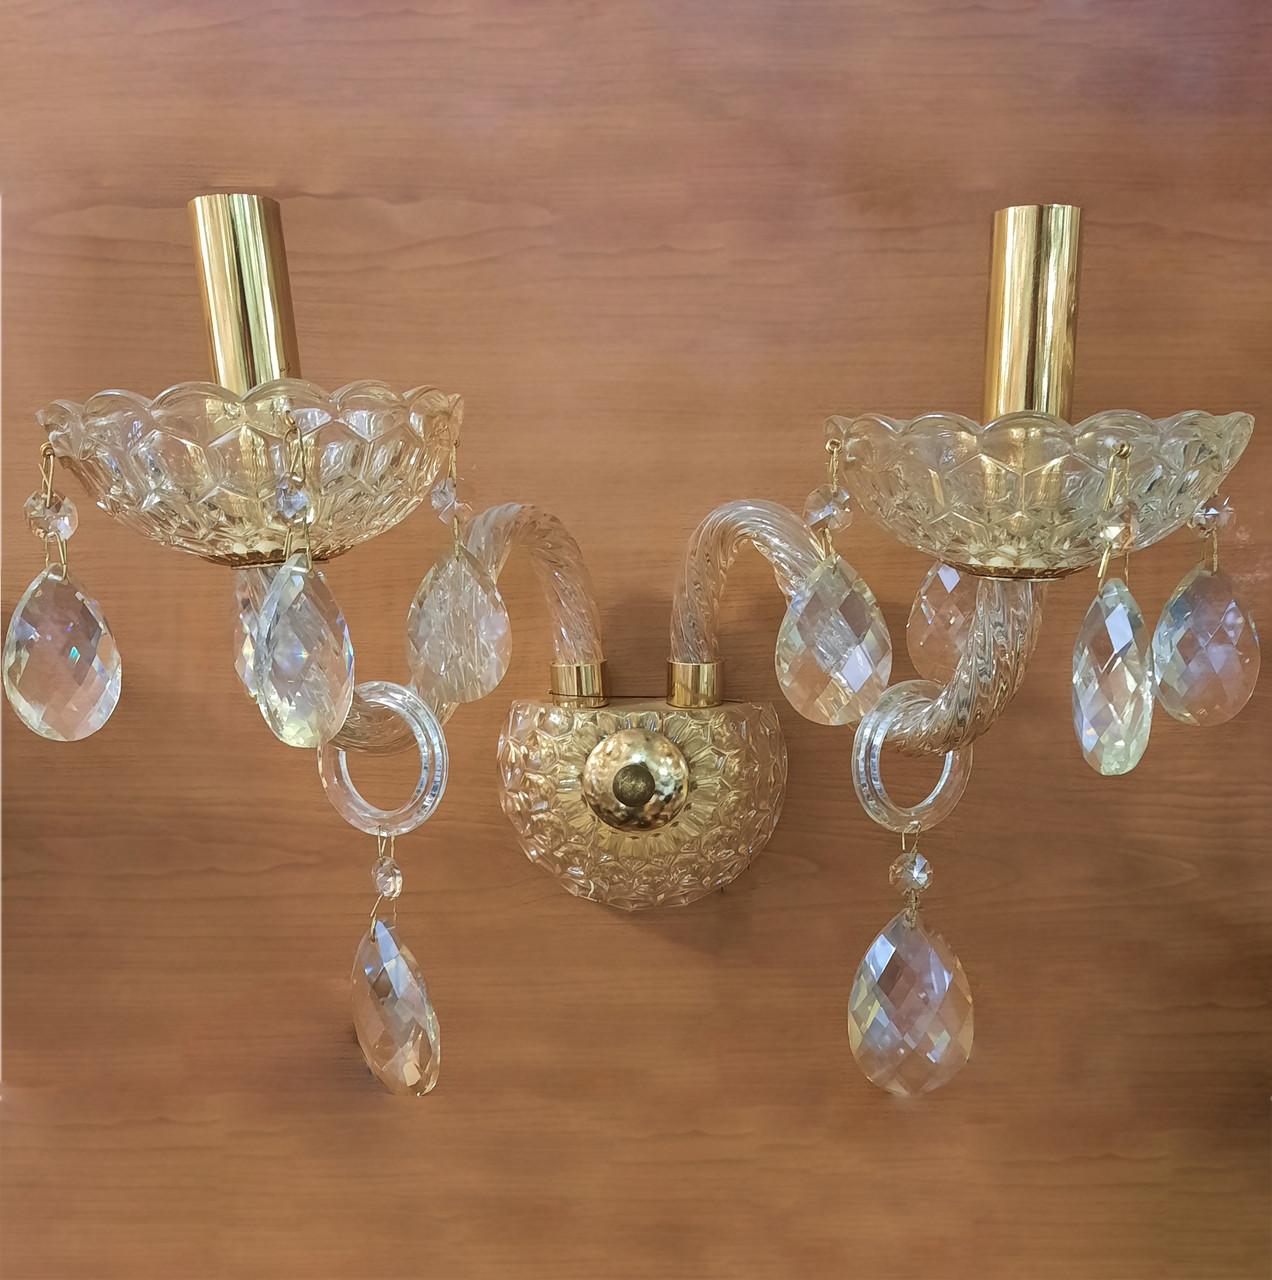 Бра, кришталь, свічки 13-8205/2W(2 лампи)